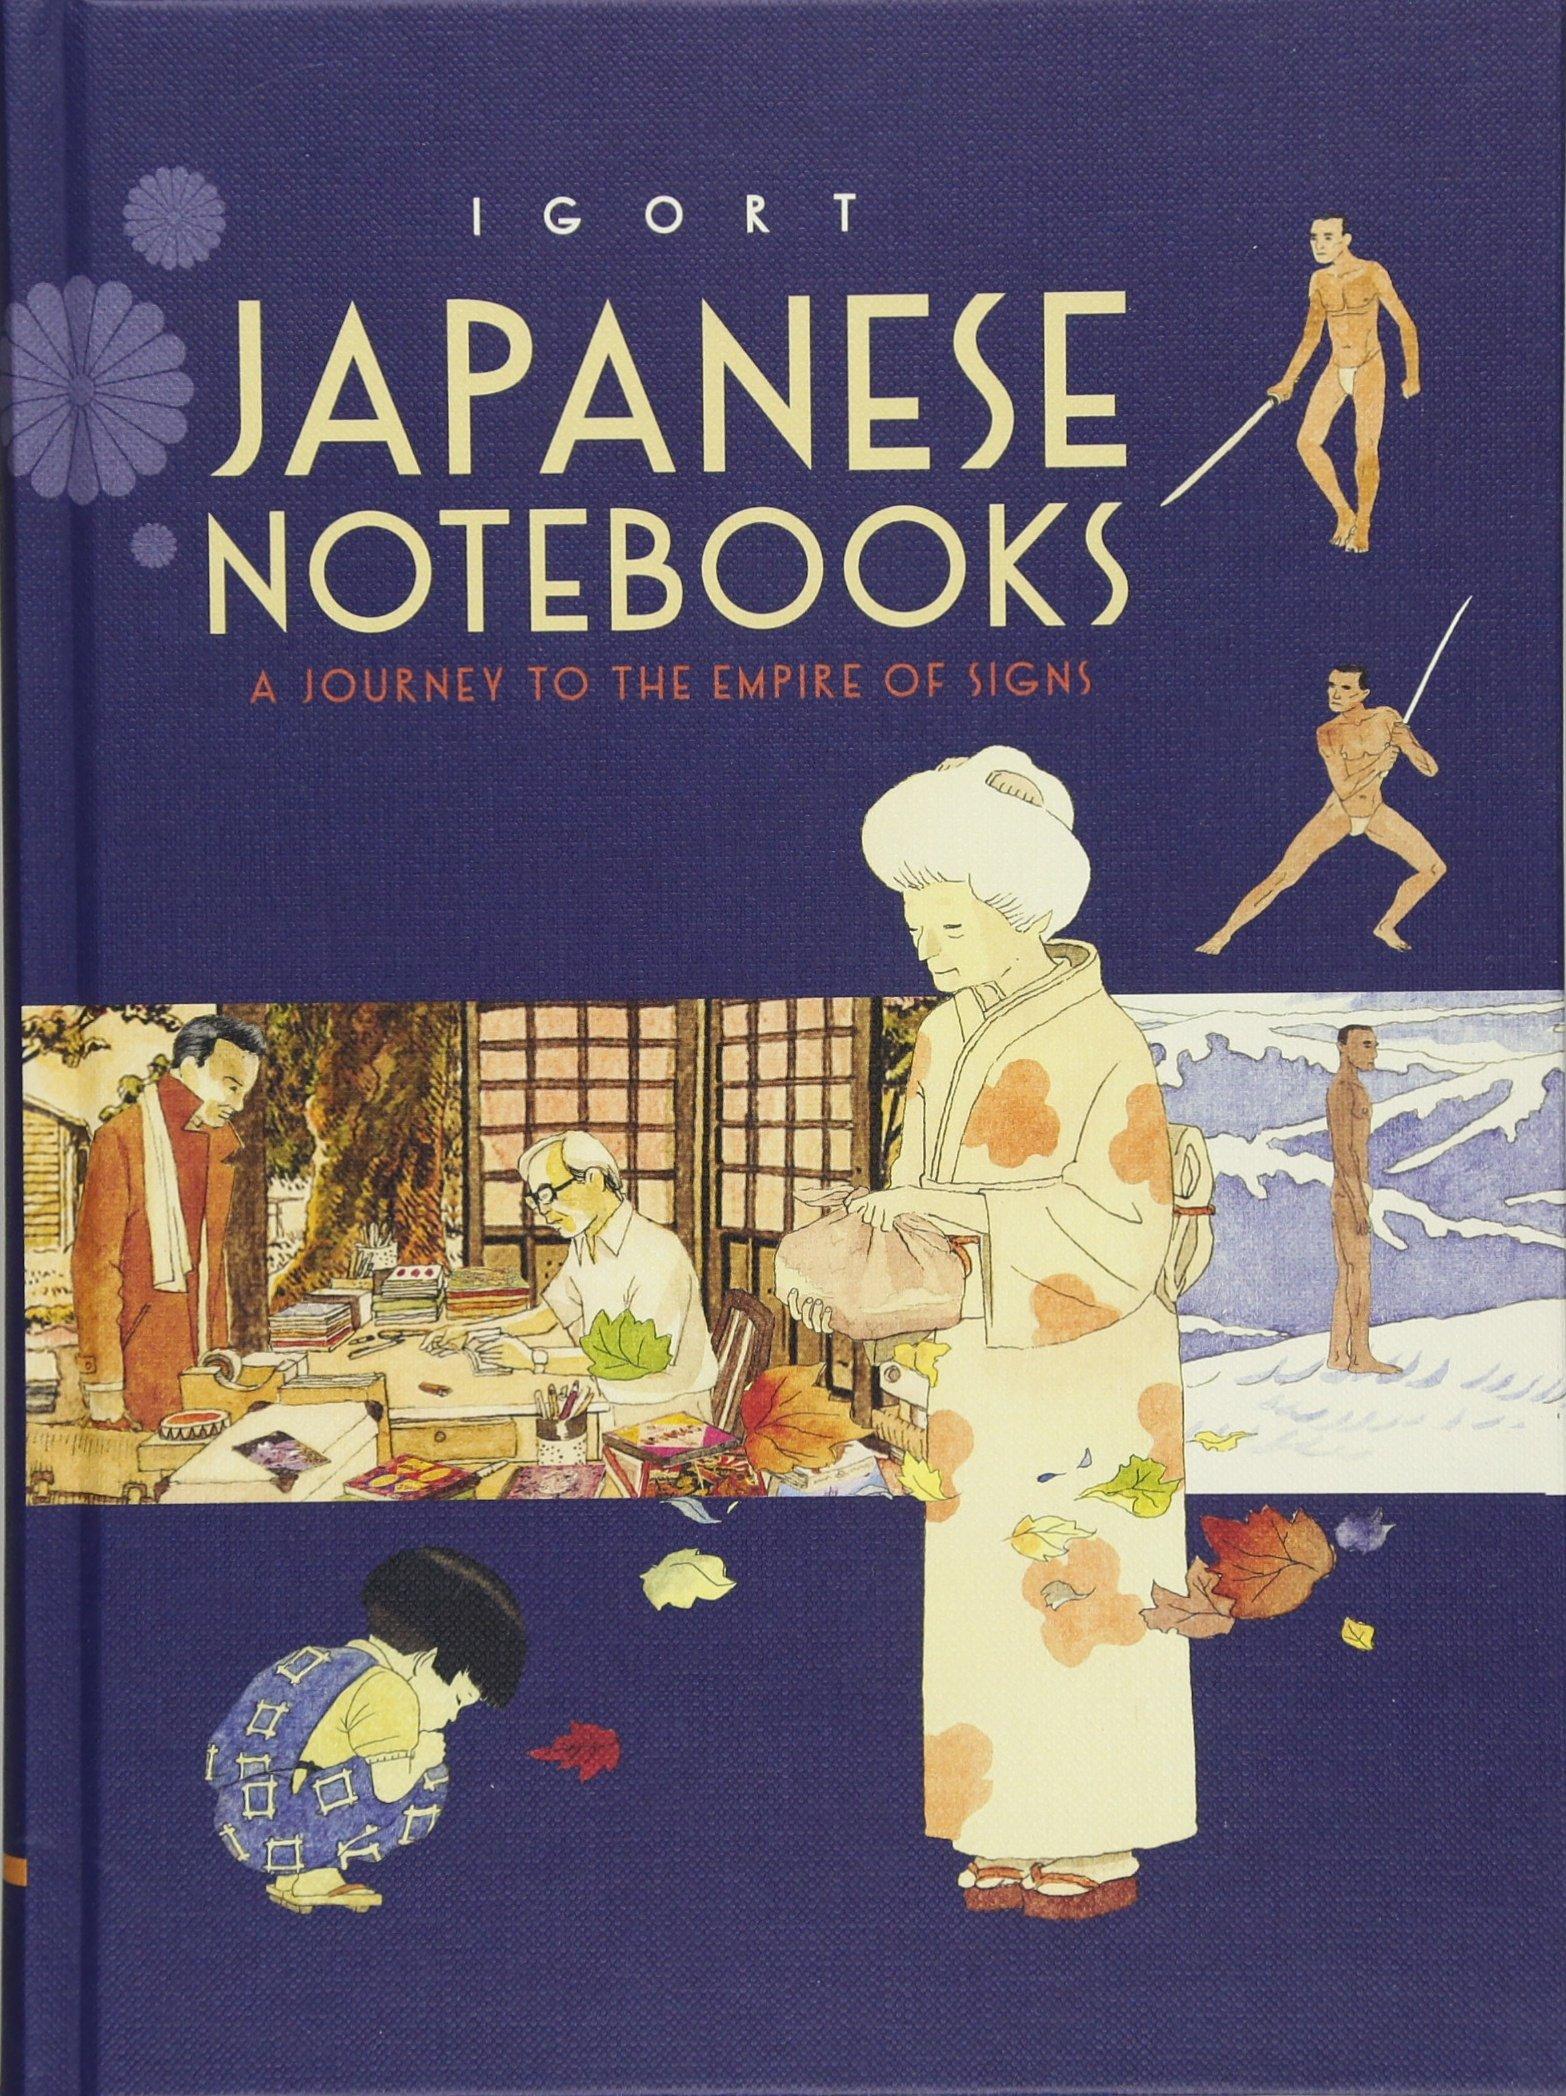 Japanese notebooks (Anglais) Relié – 1 avril 2017 Igort Chronicle Books 1452158703 Sociology